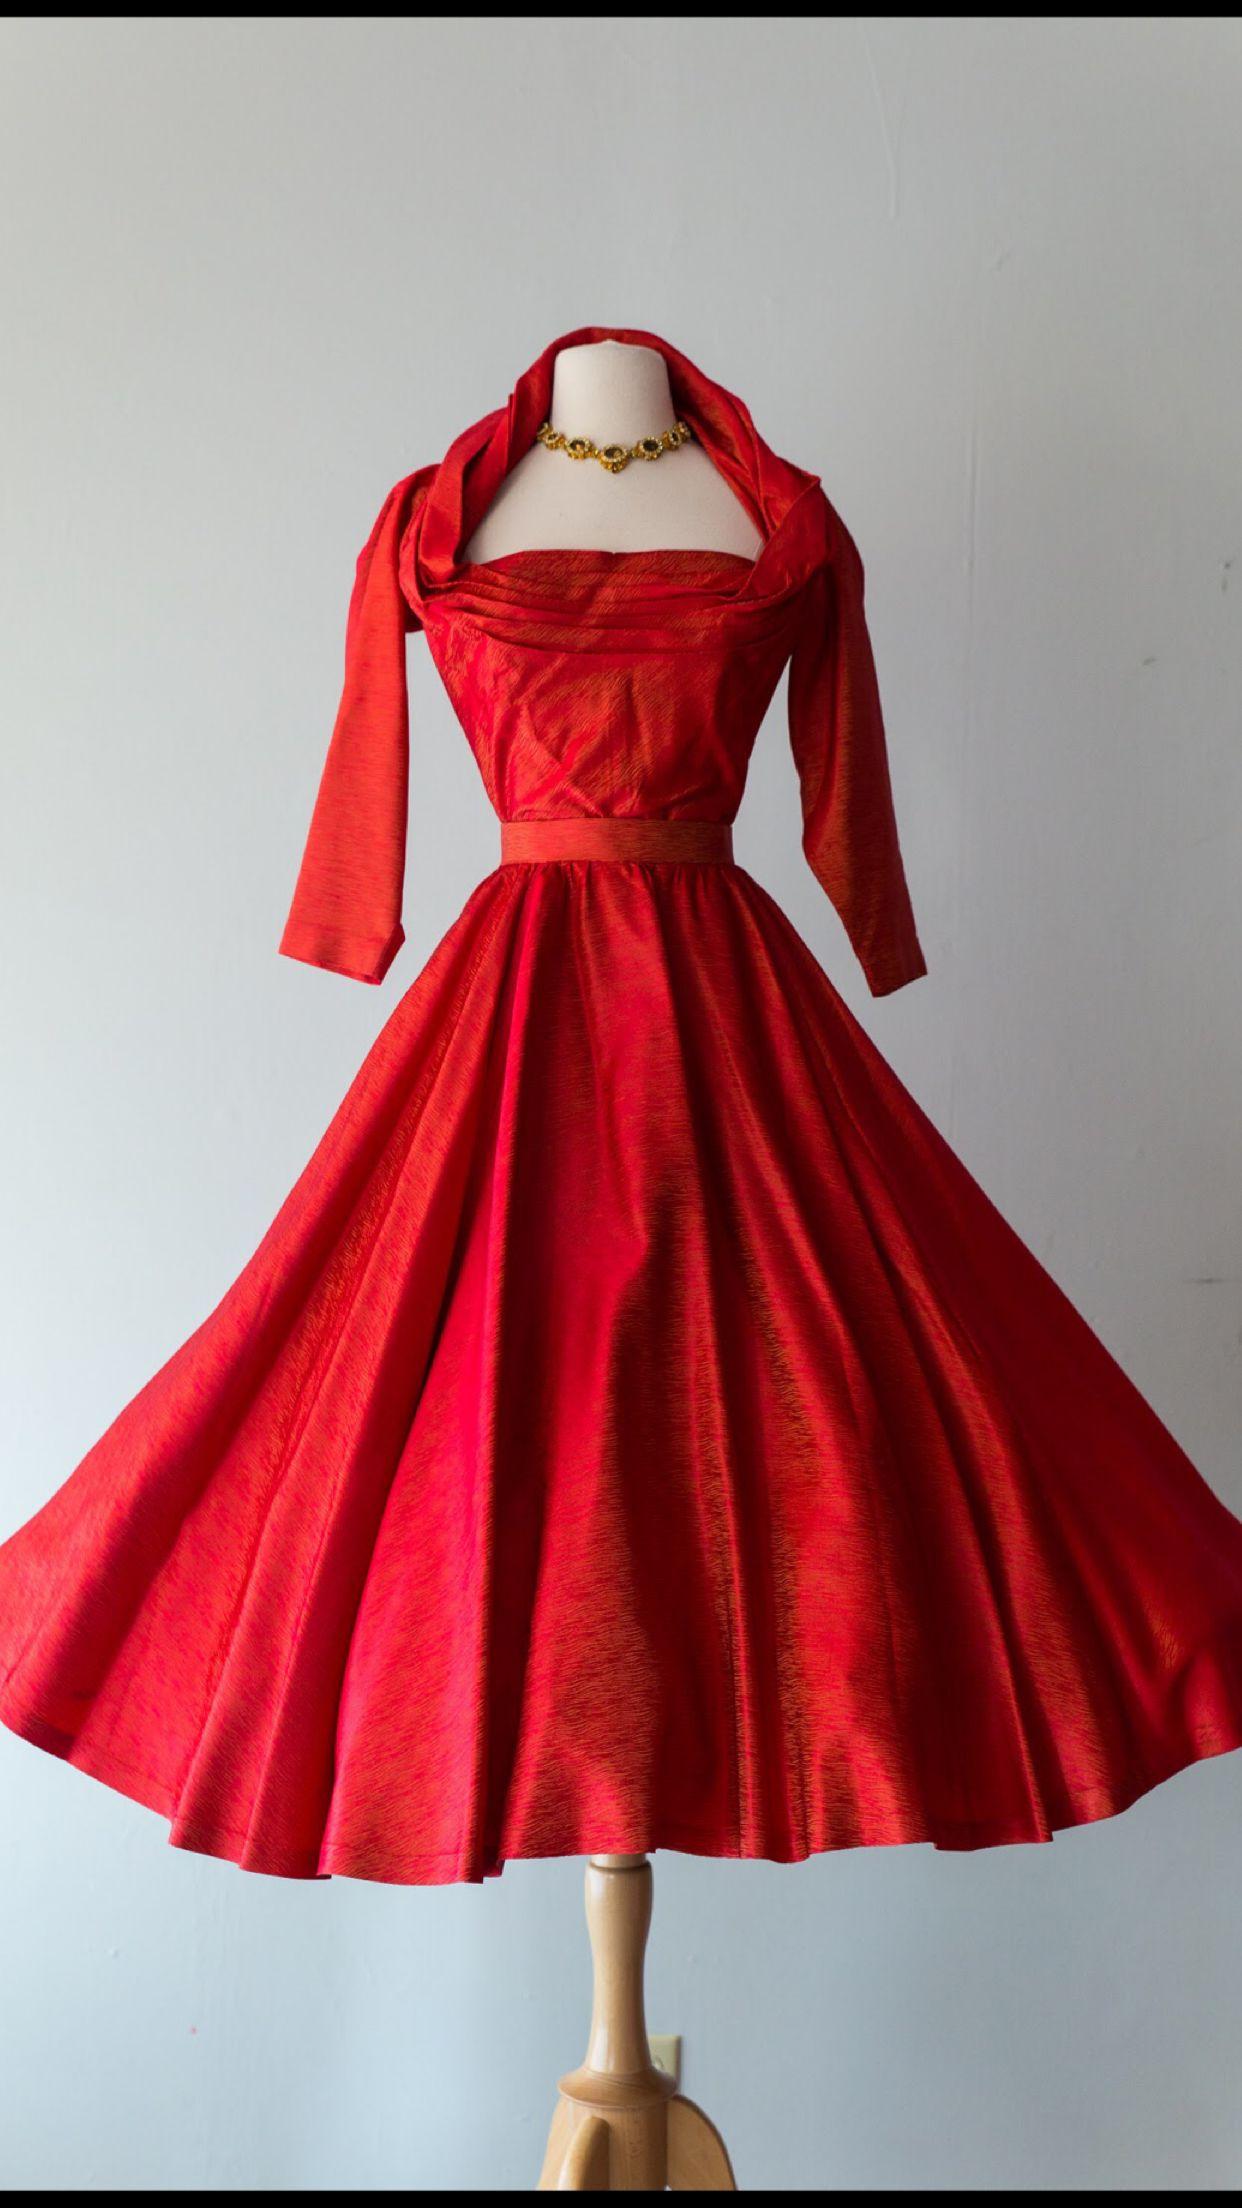 Vintage 1950 S Jean Desses Designed Red Cocktail Dress Xtabay Vintage Xtabayvintage Com Vintage Red Dress Dresses Vintage Clothing Boutique [ 2208 x 1242 Pixel ]